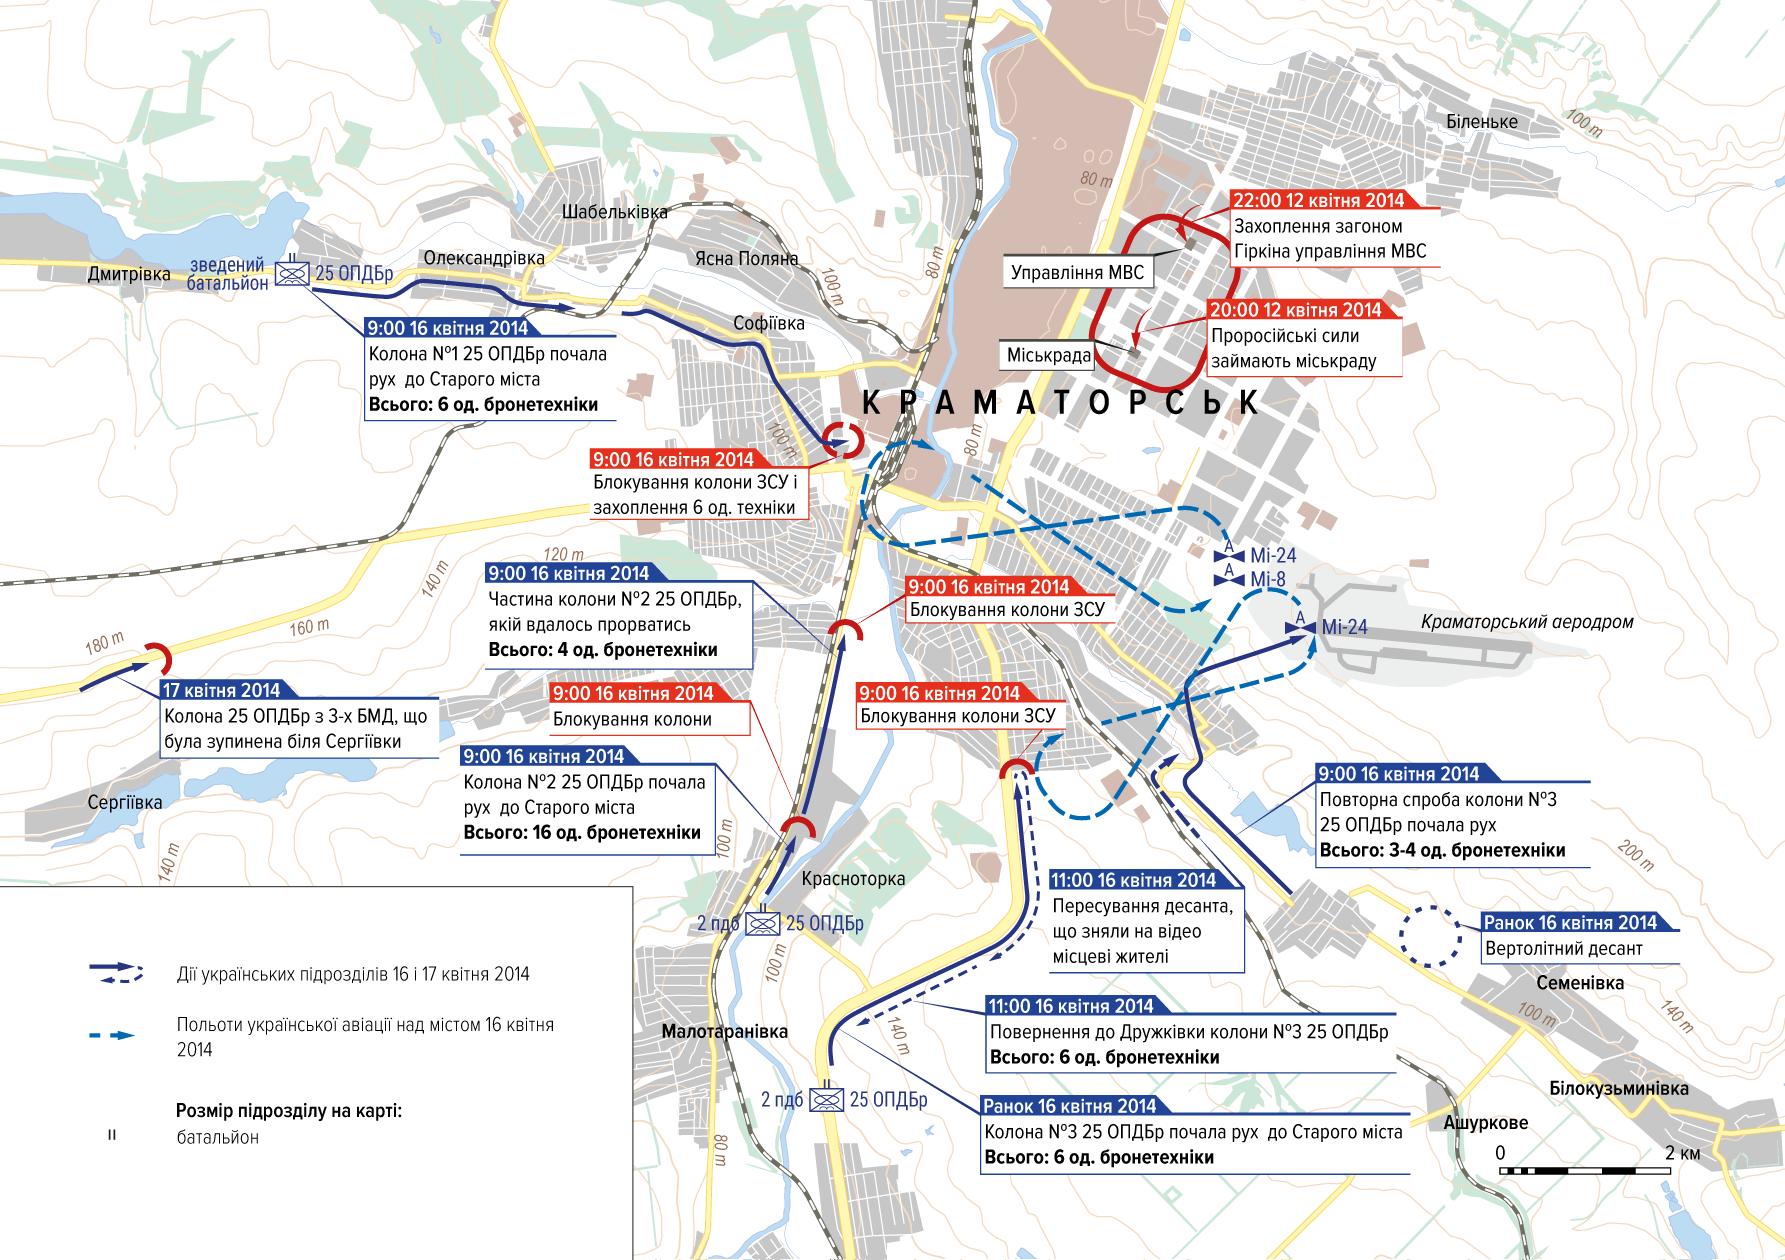 Ситуація у Краматорську. 16 квітня 2014.